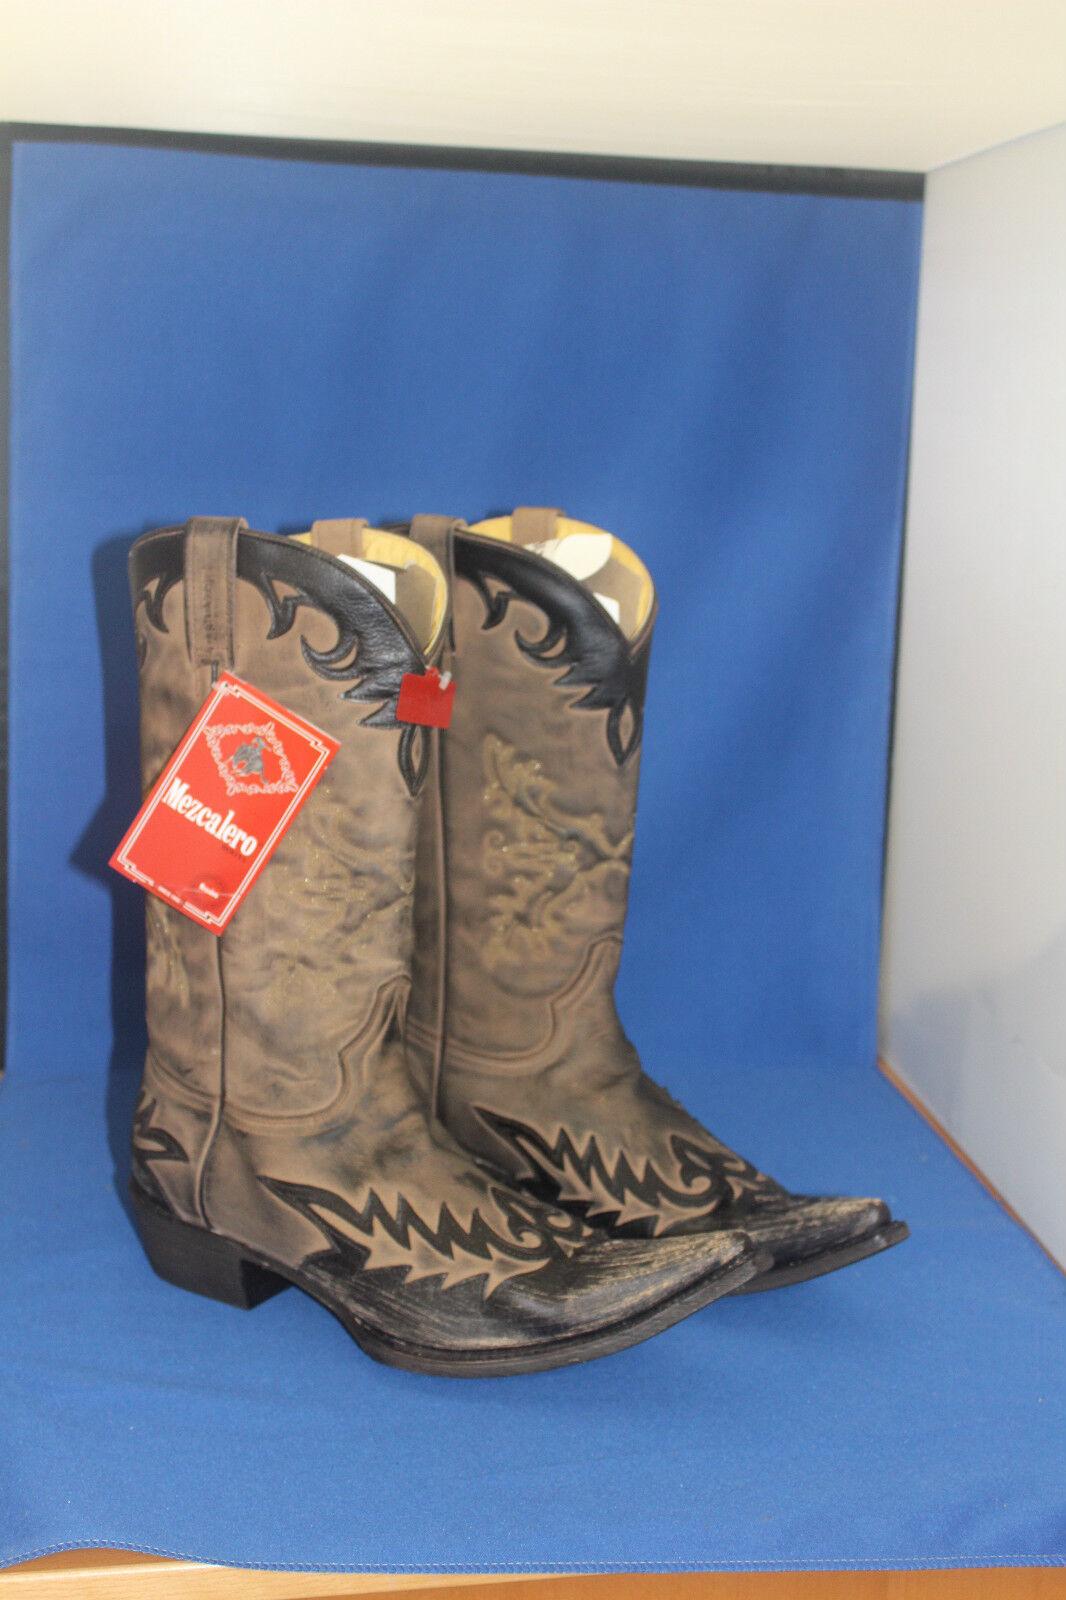 Mezcalero Stiefel Stiefel  westernstiefel cowboystiefel neu  gr. 42  neu cowboystiefel  leder be145a